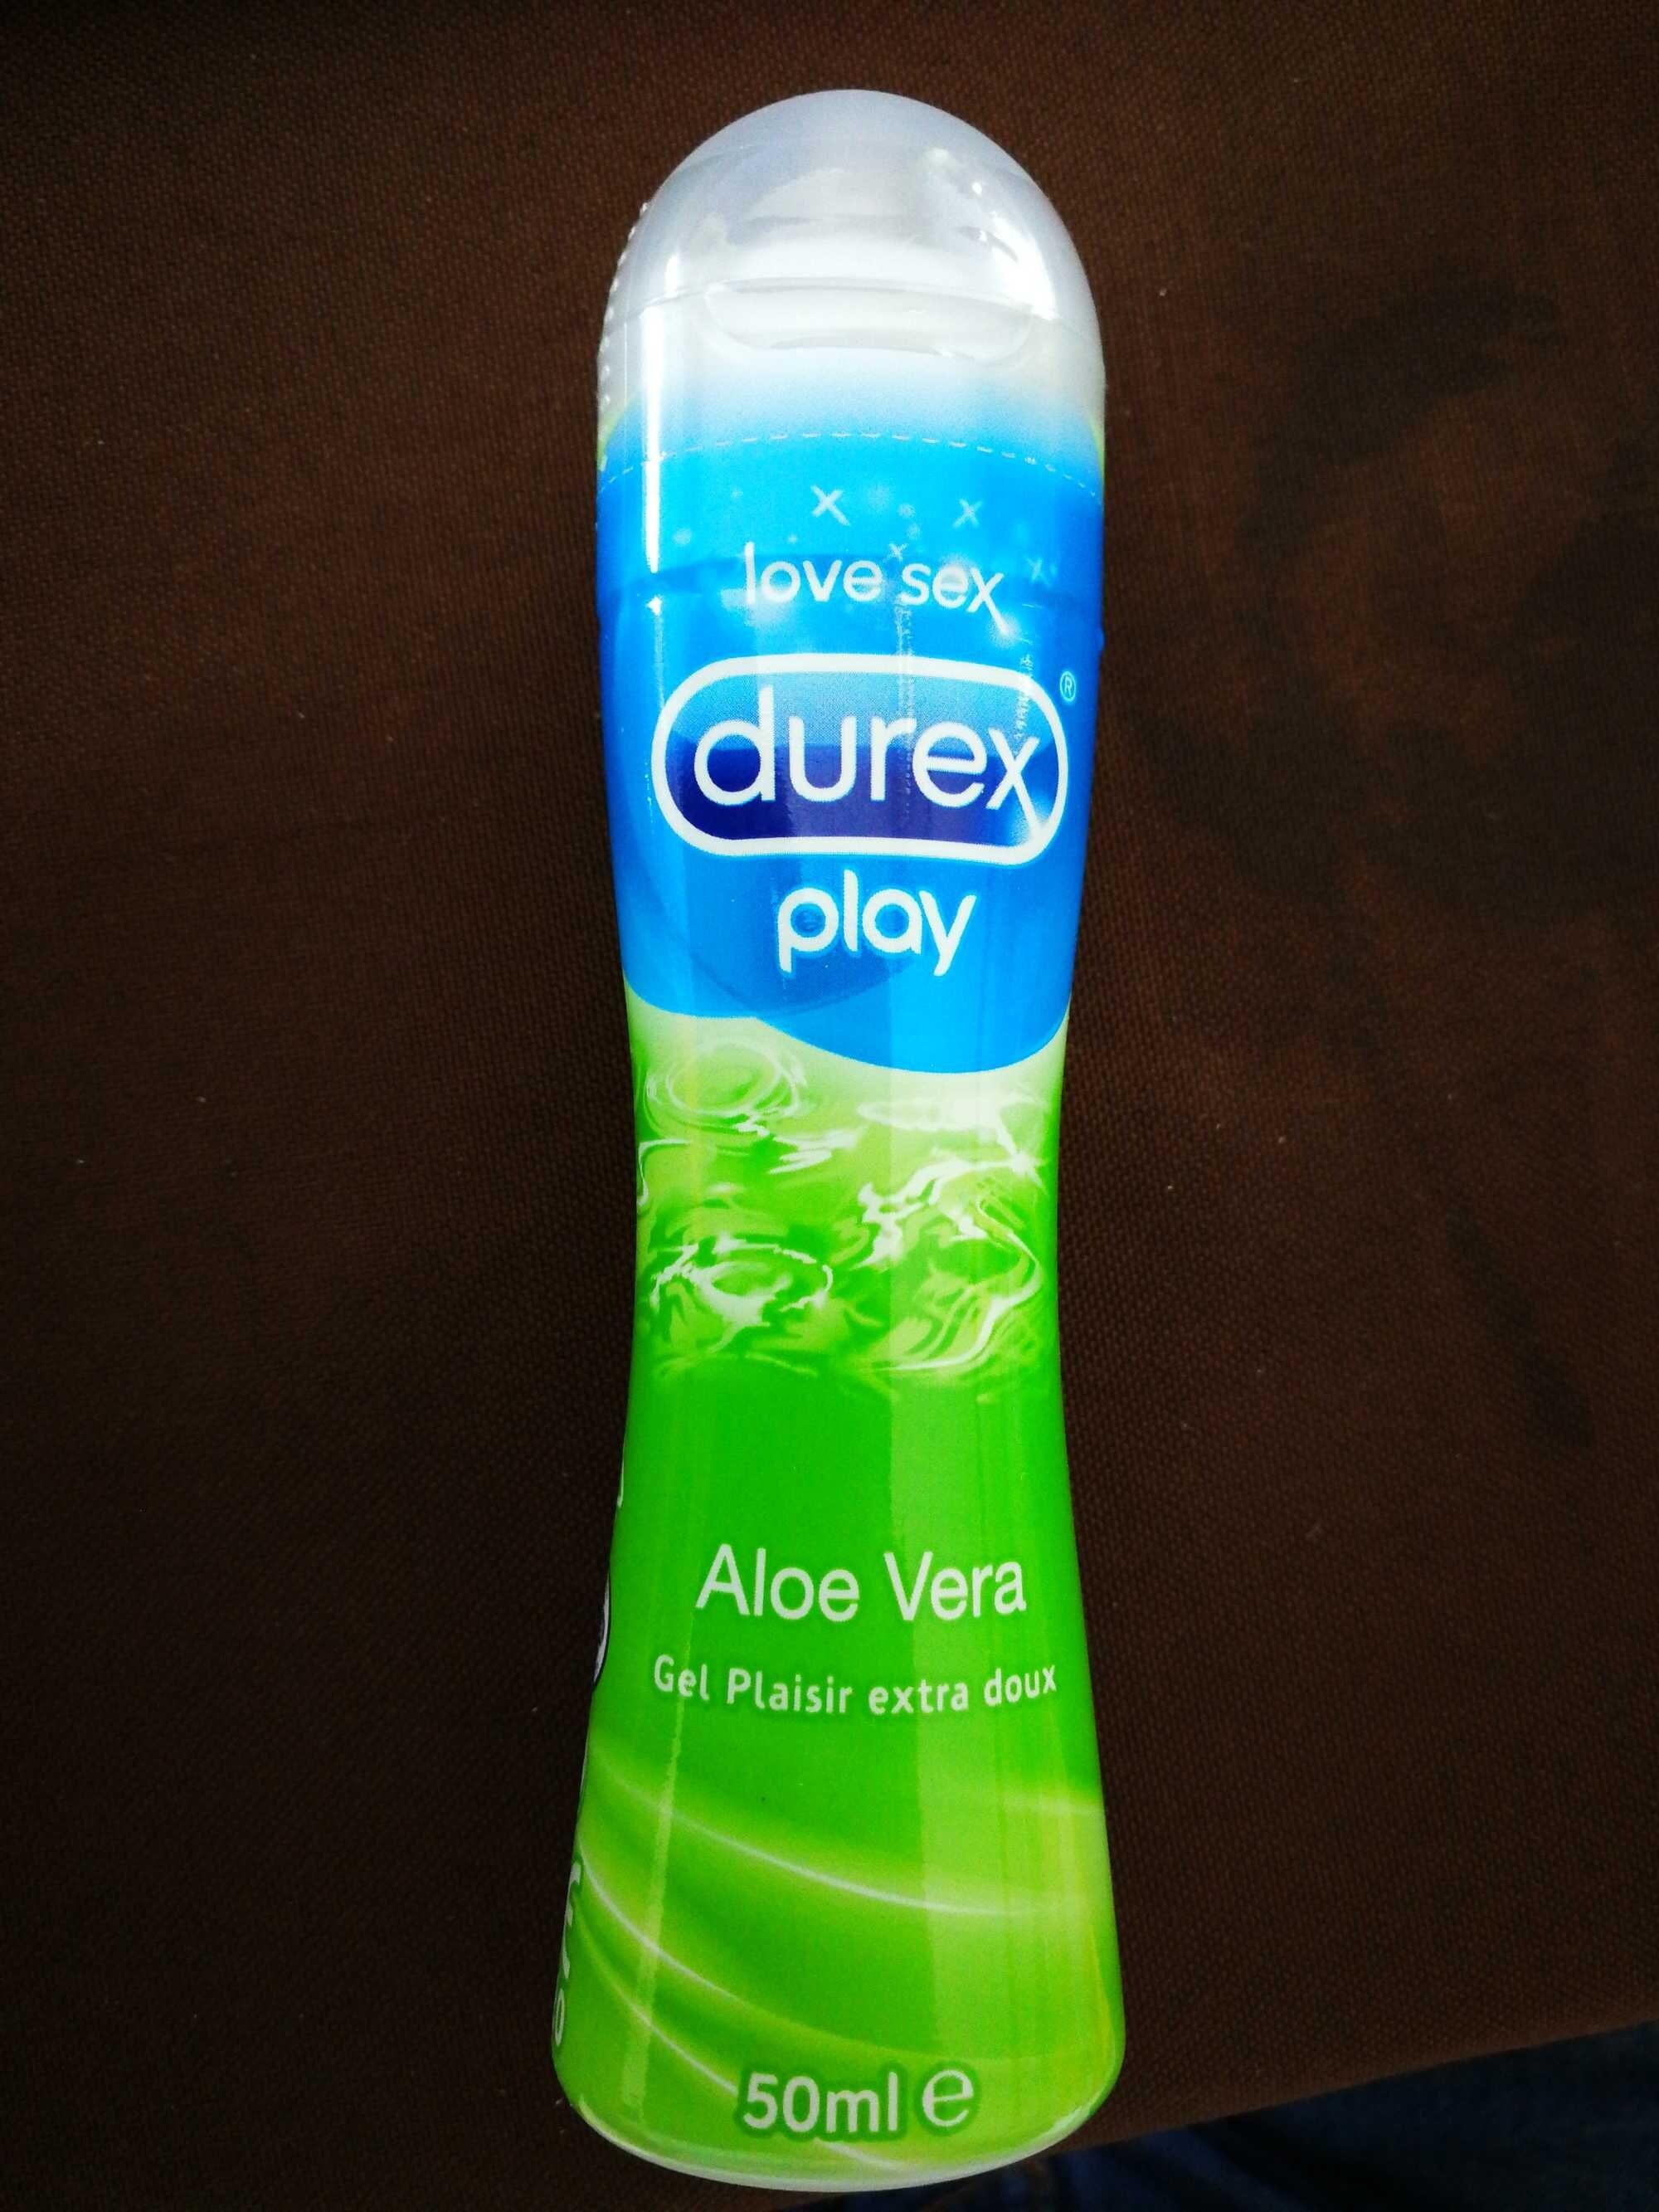 Durex play aloe Vera gel plaisir extra doux - Product - fr